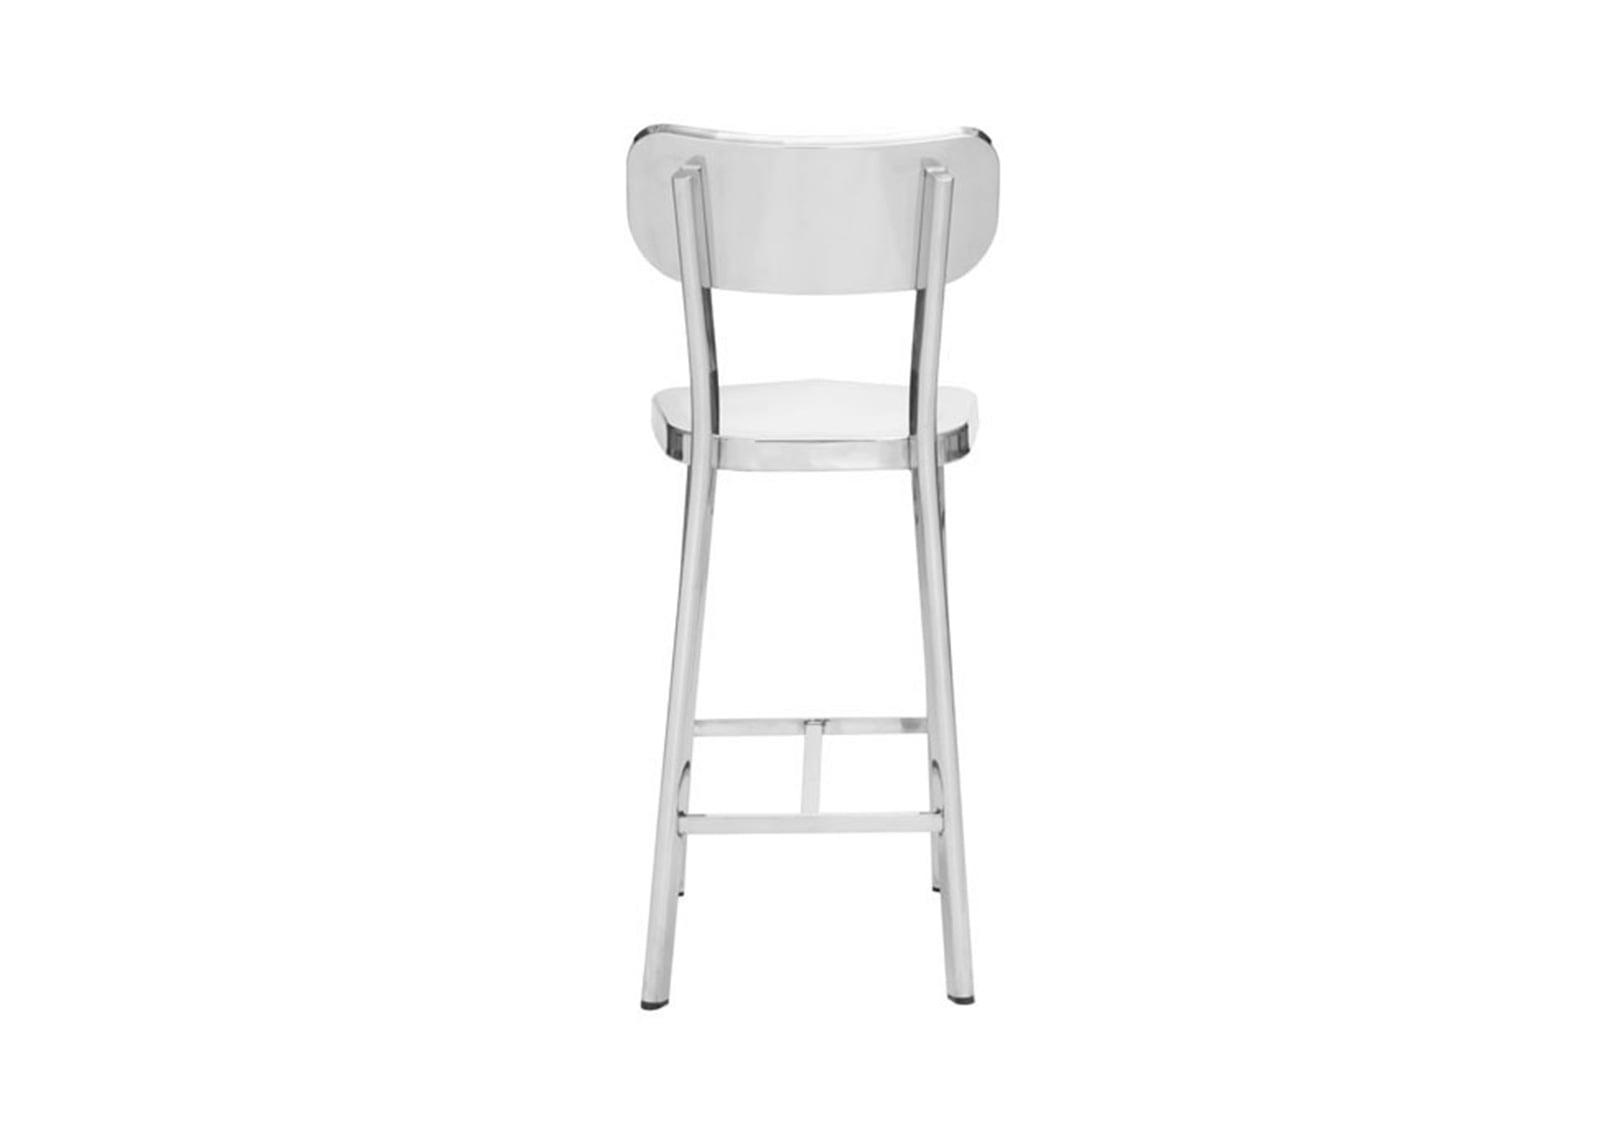 stainless steel chair legs earthlite avila ii massage winter counter furnishplus